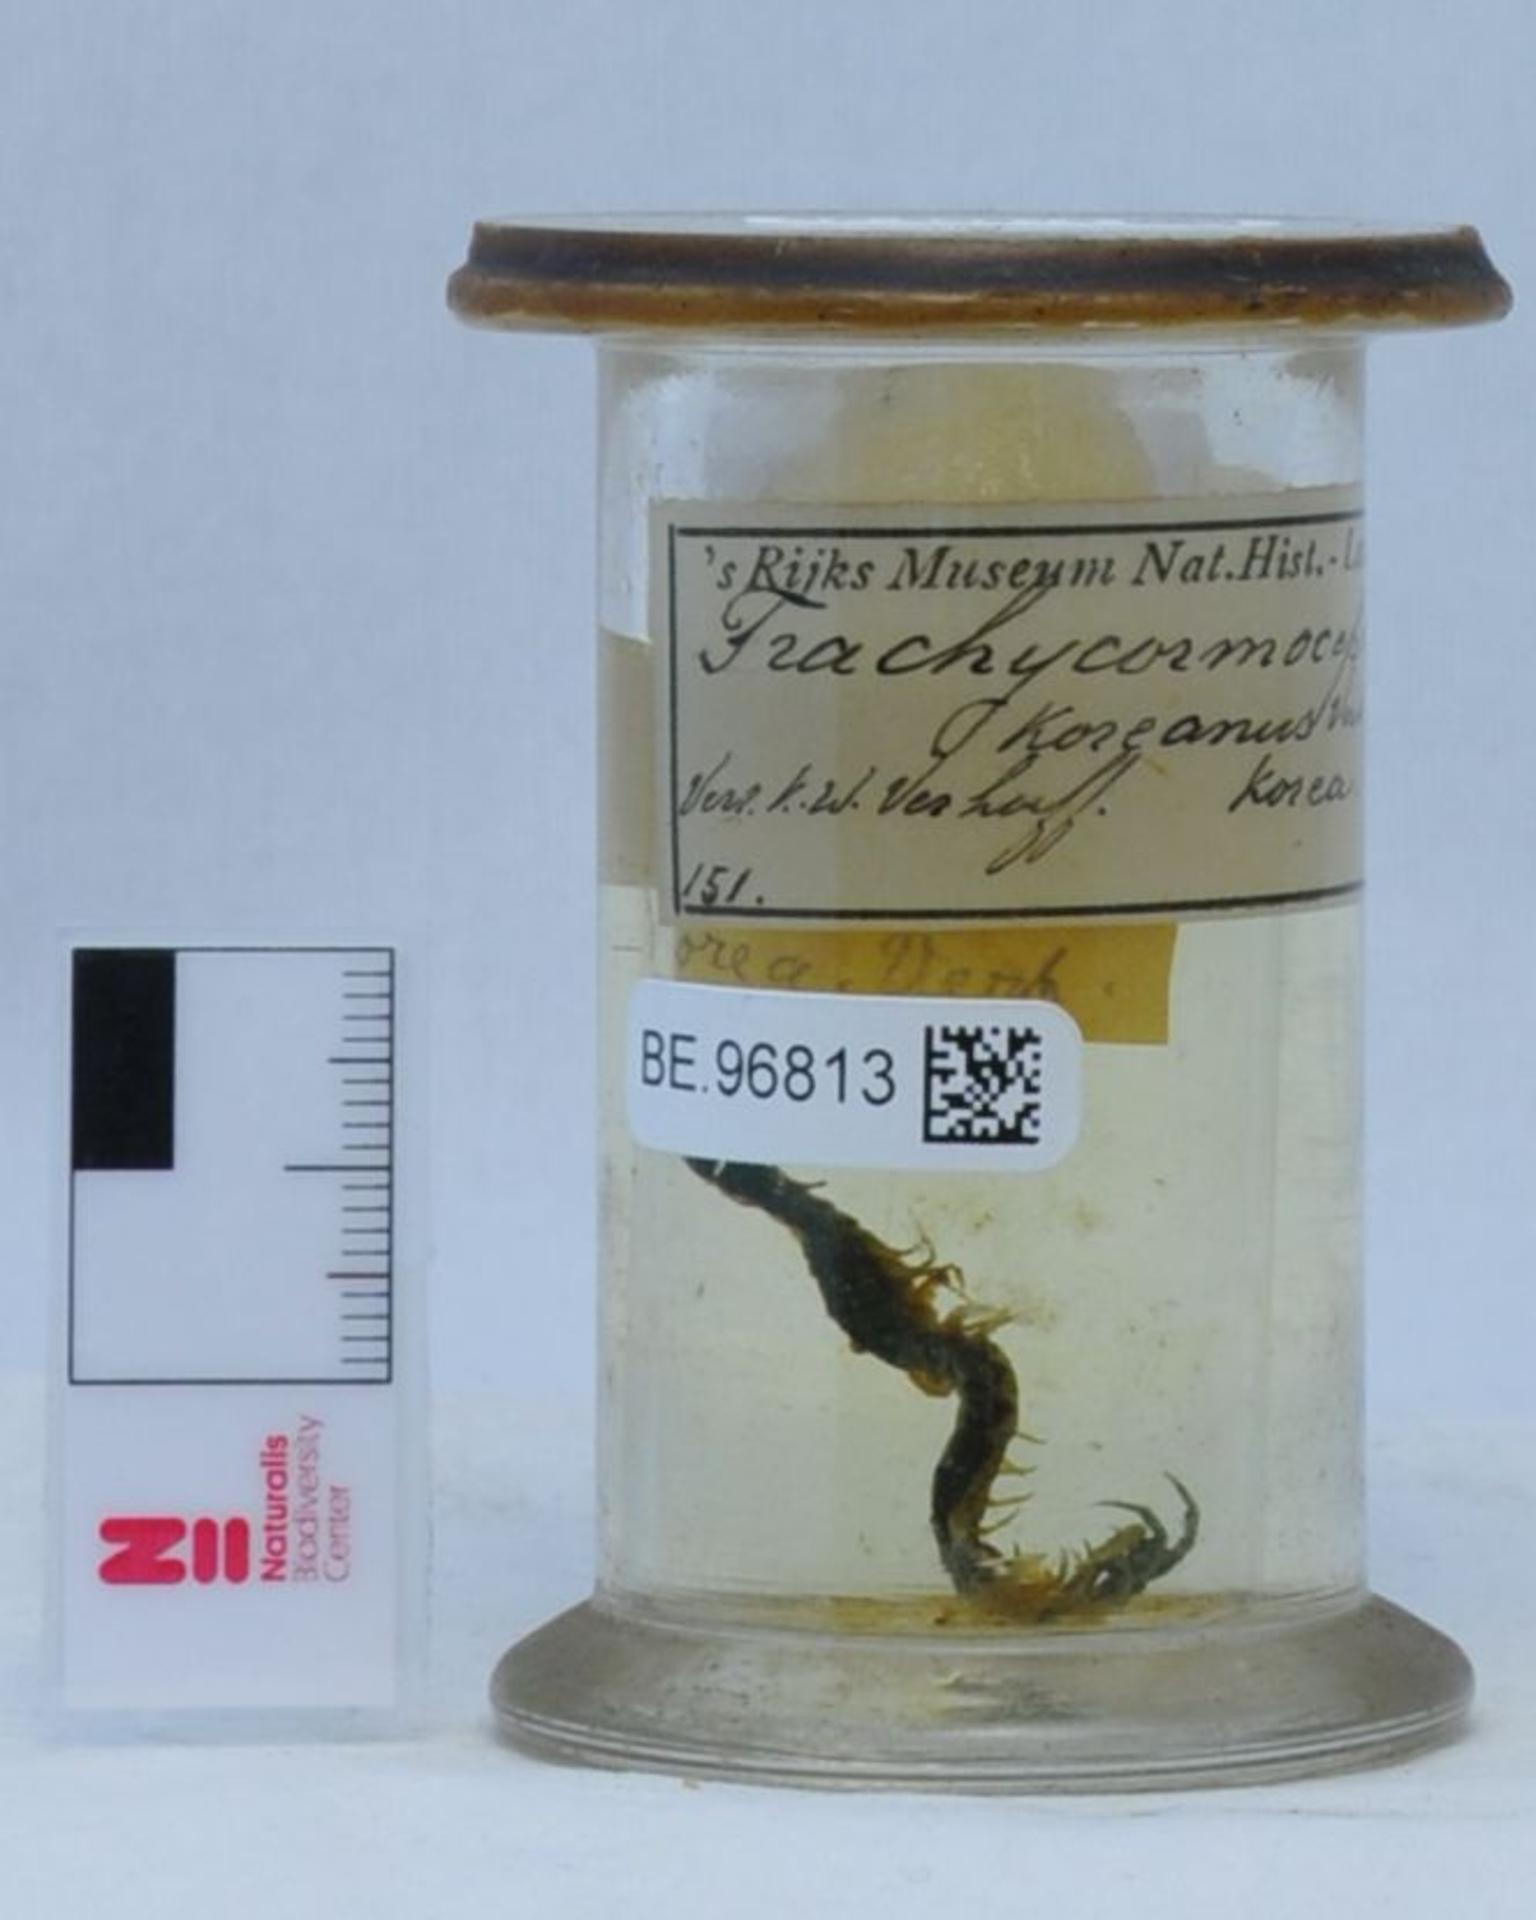 RMNH.CHIL.151   Otostigmus (Otostigmus) koreanus (Verhoeff, 1934)